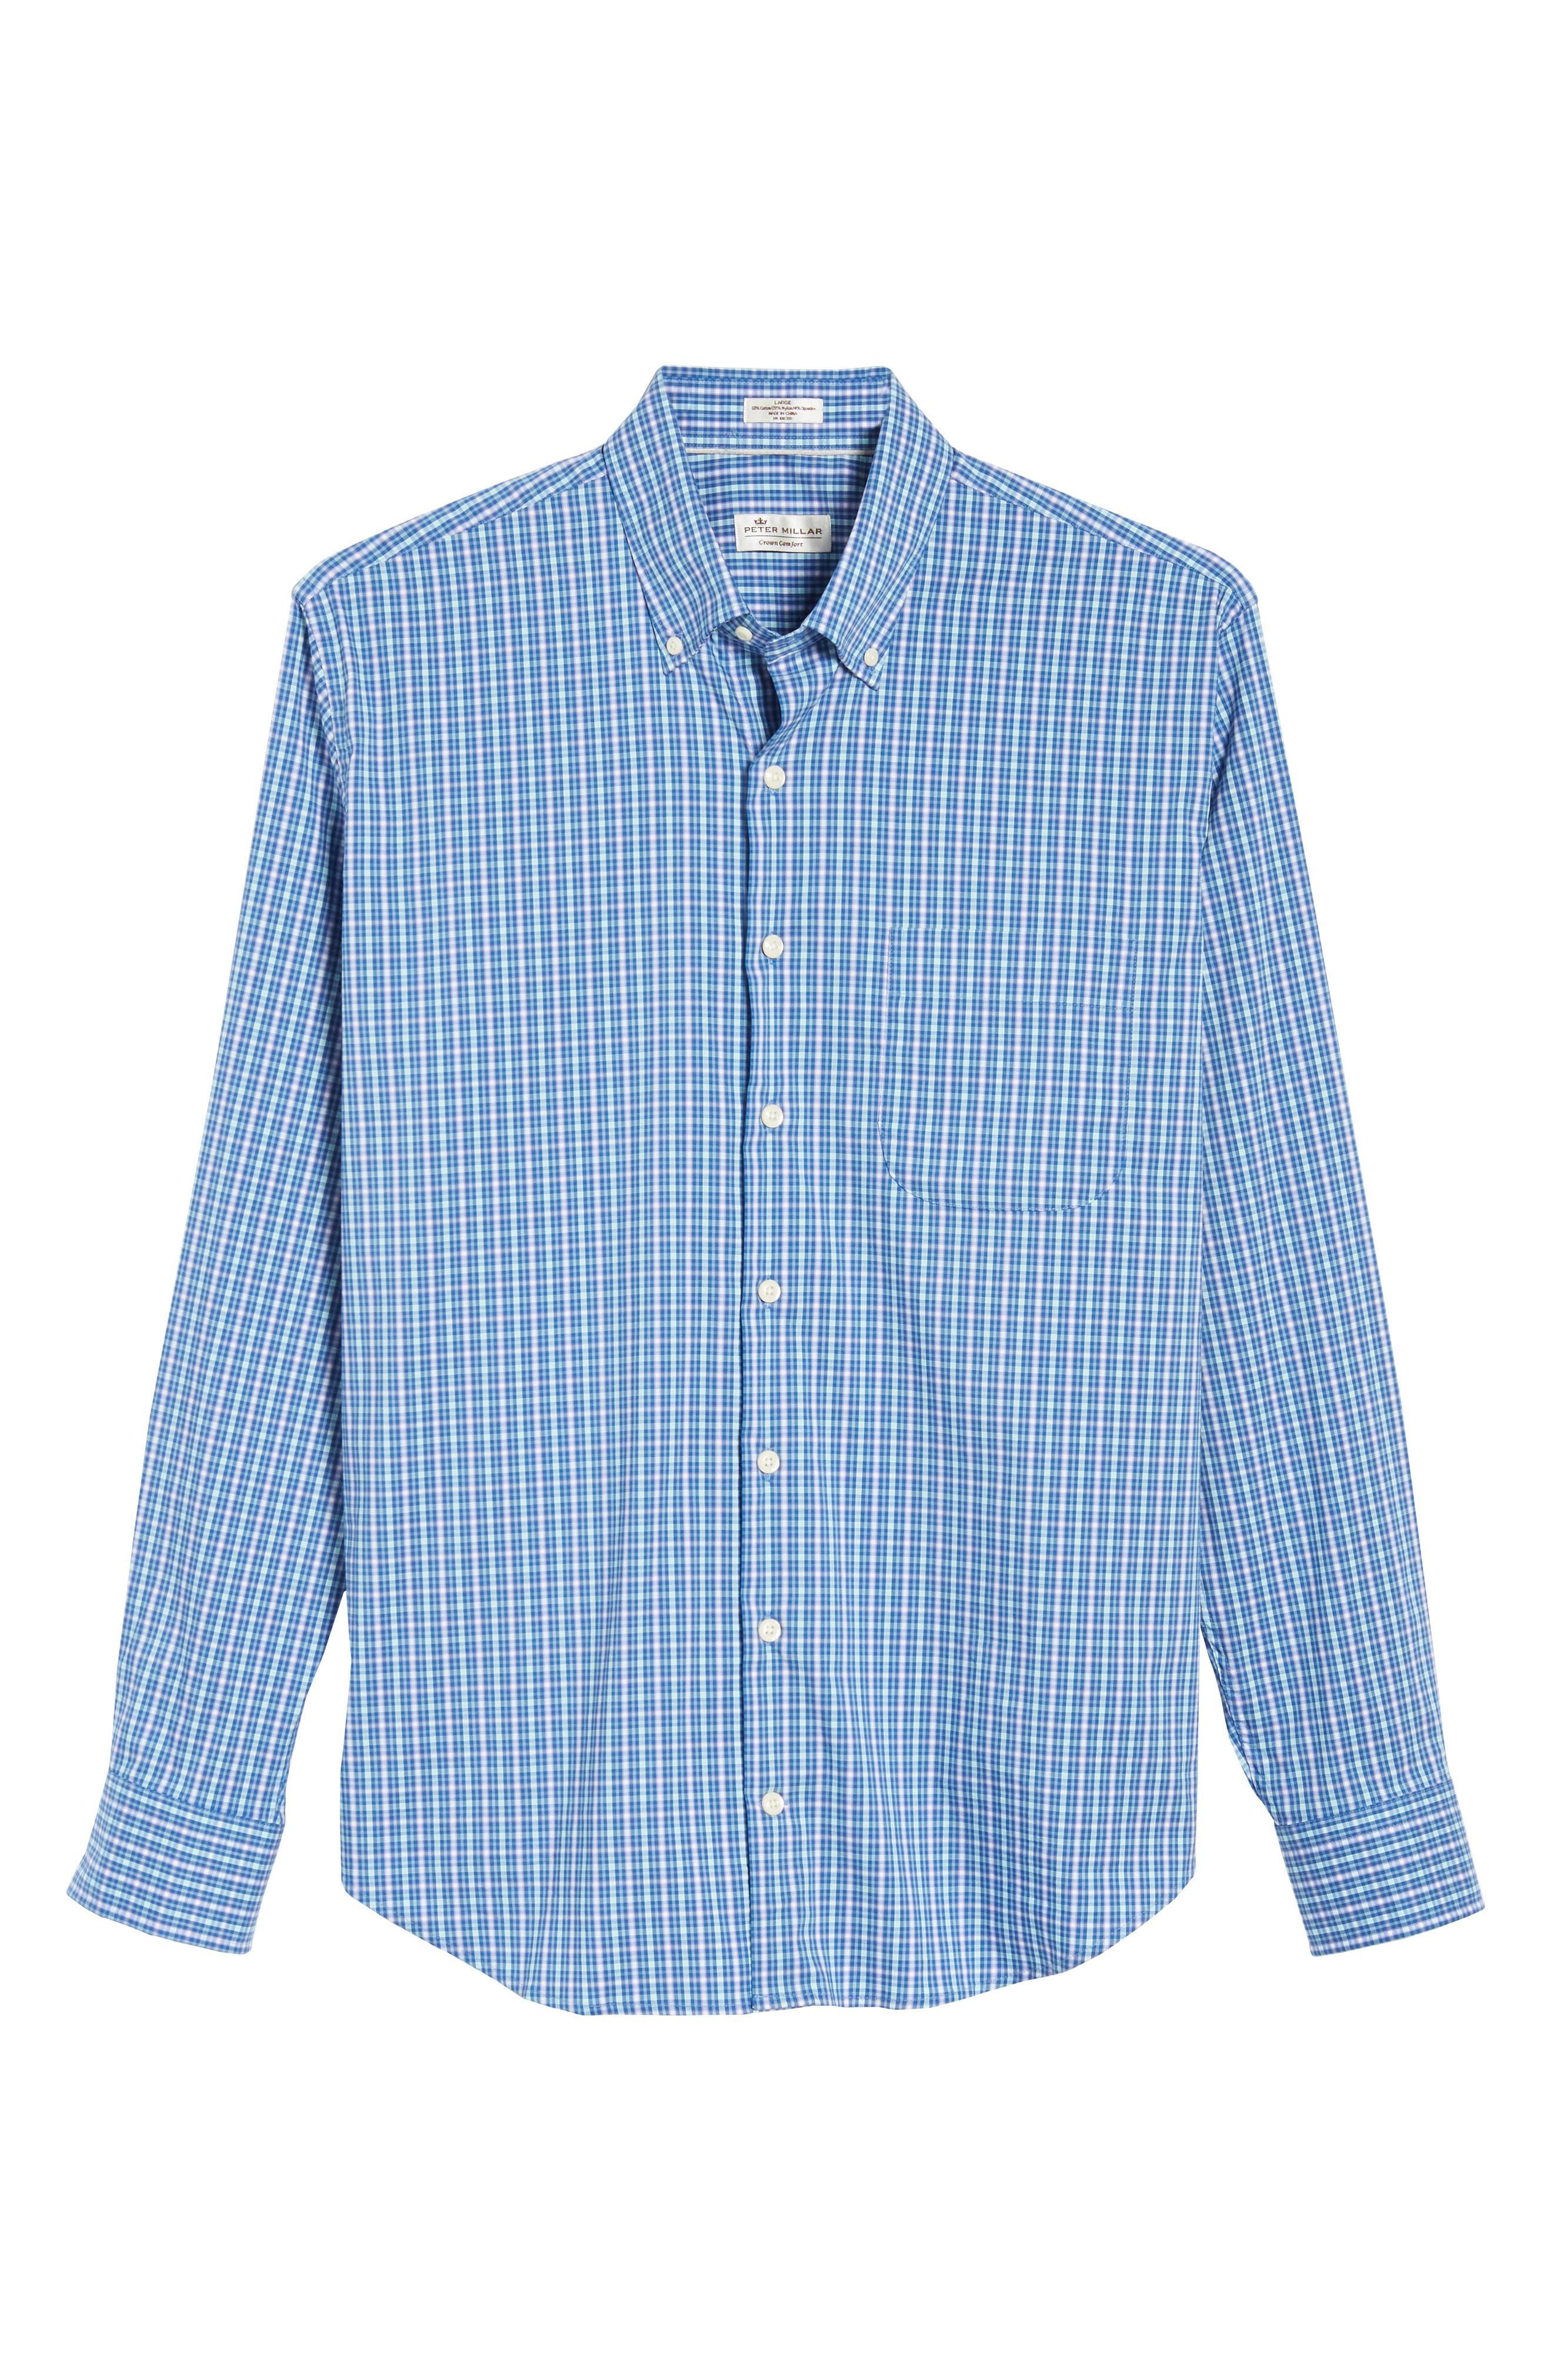 Crown Comfort Finch Multicheck Sport Shirt,                             Alternate thumbnail 6, color,                             422